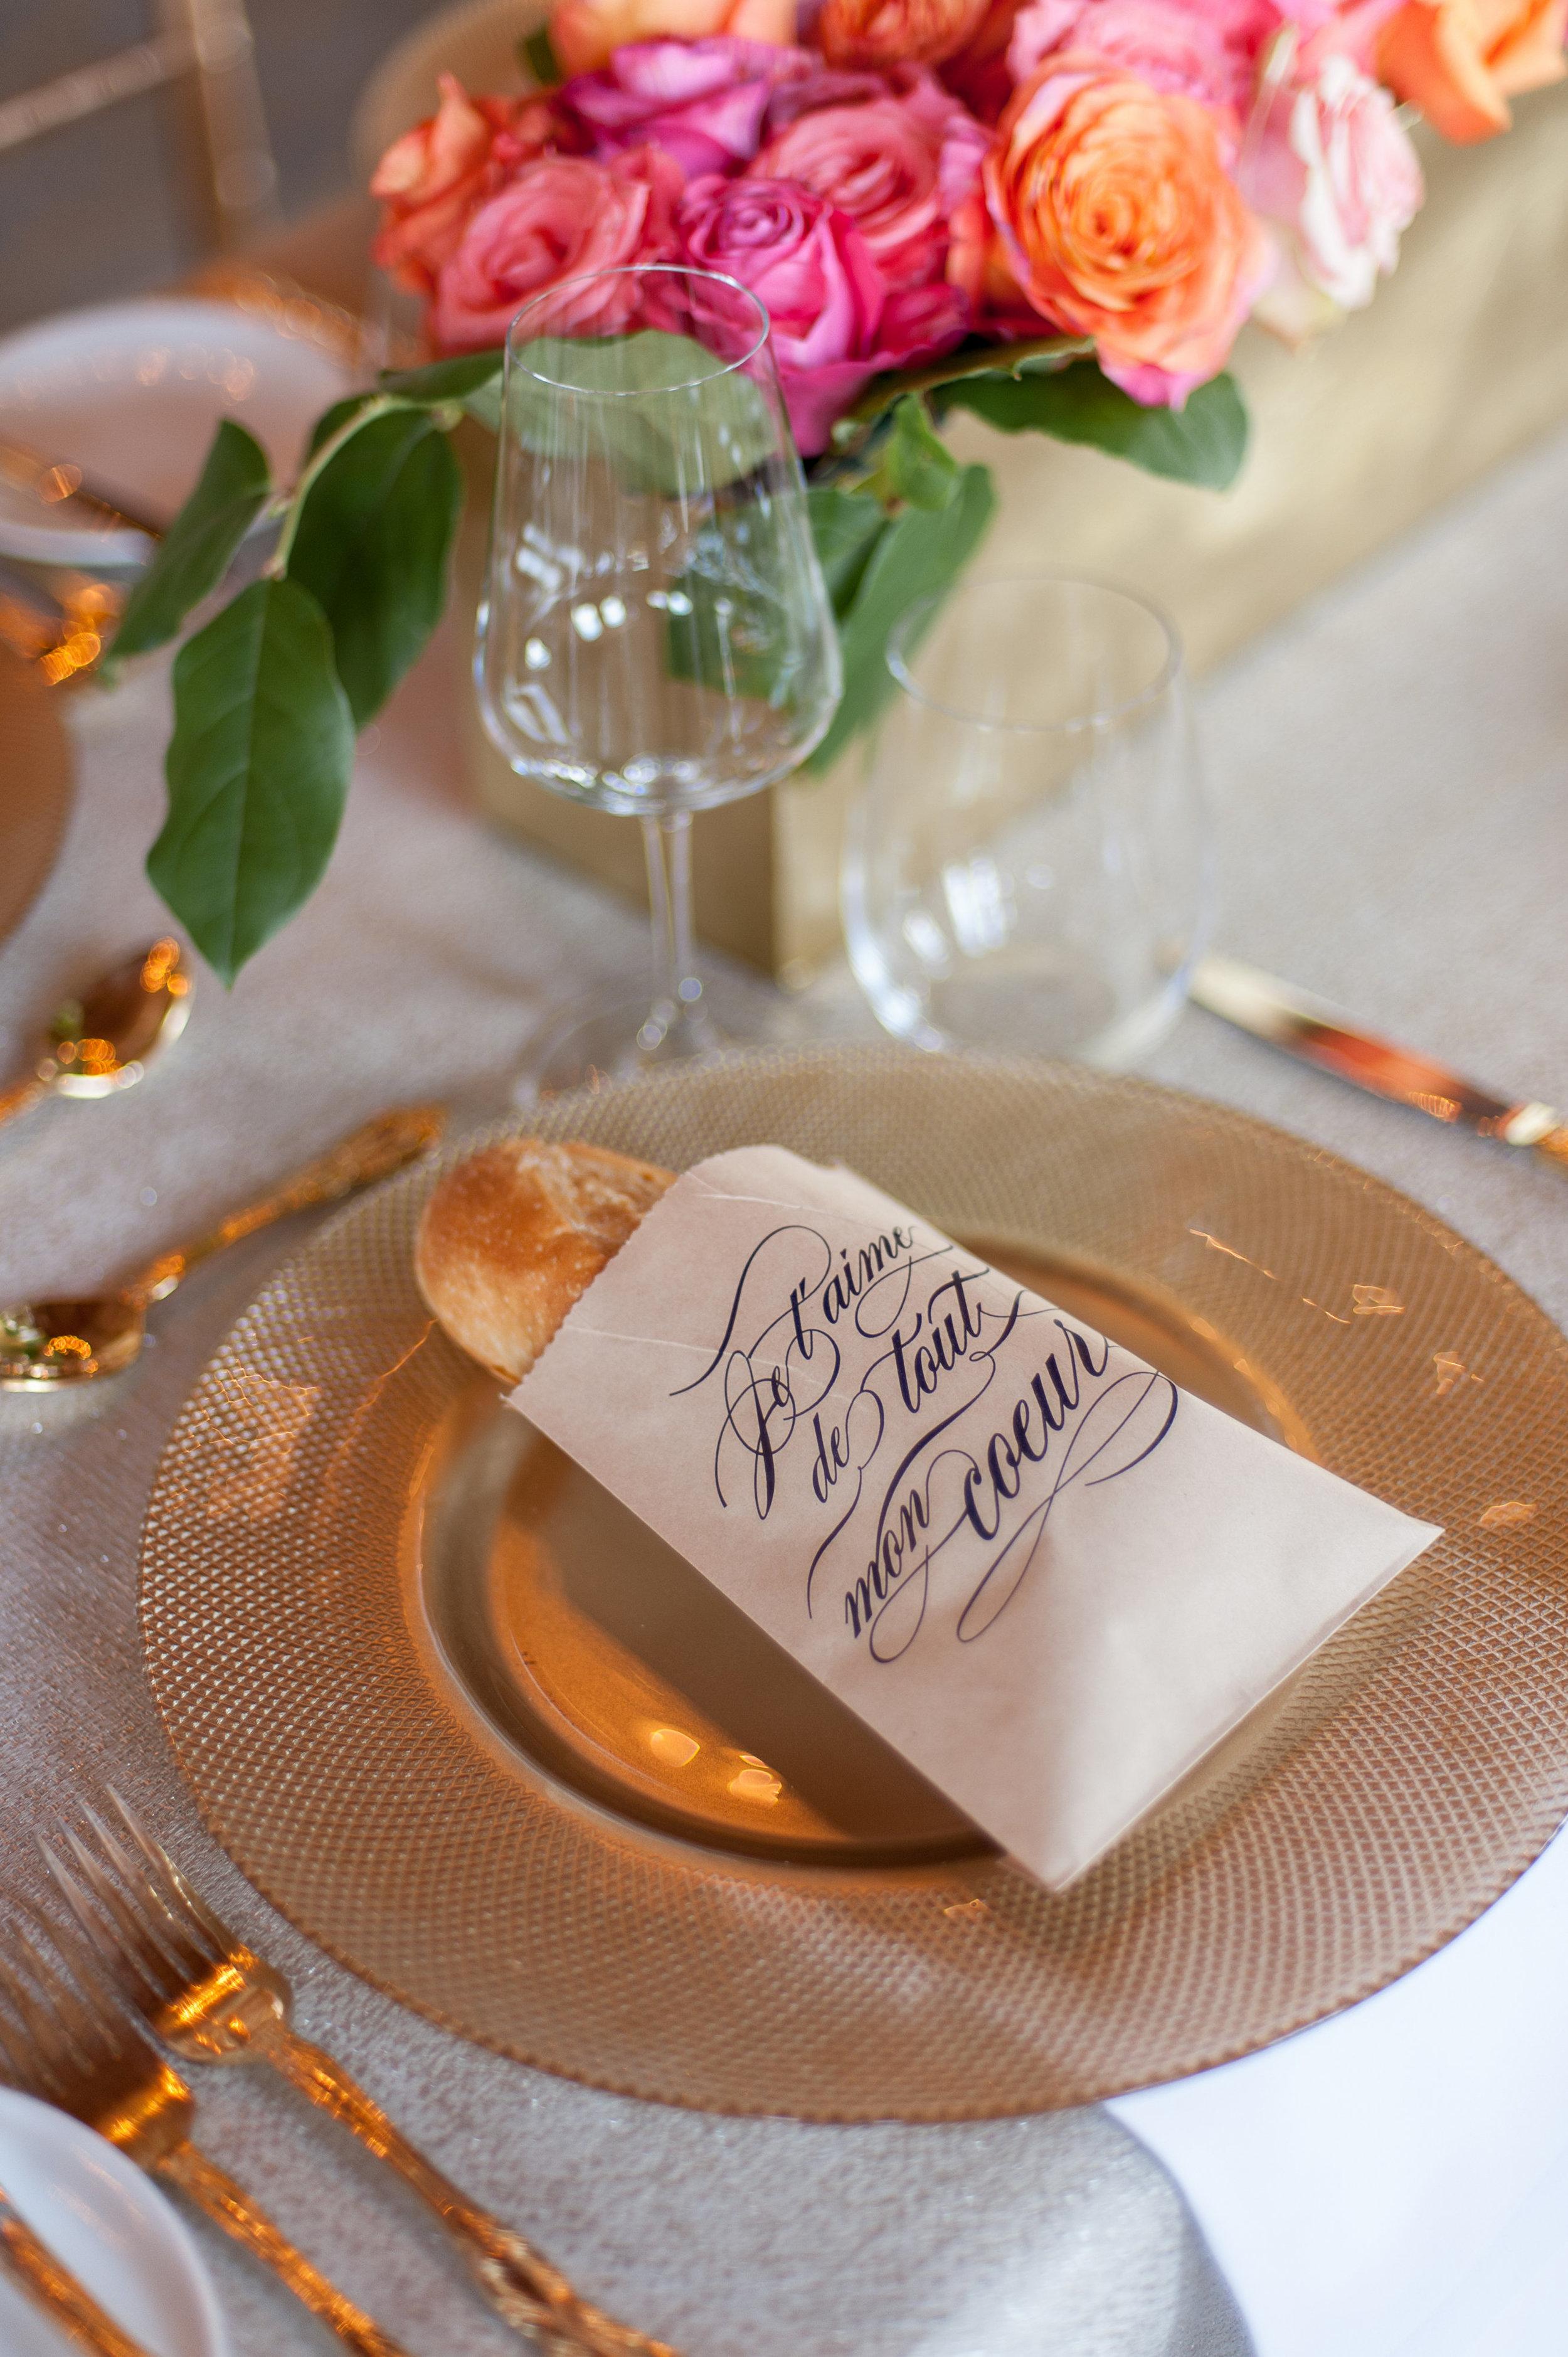 Jewellery- Tara Fava Jewellery, Photography - Krista Fox Photography, Cake & Sweet Table- Truffle Toronto,Venue - Magna Golf Club